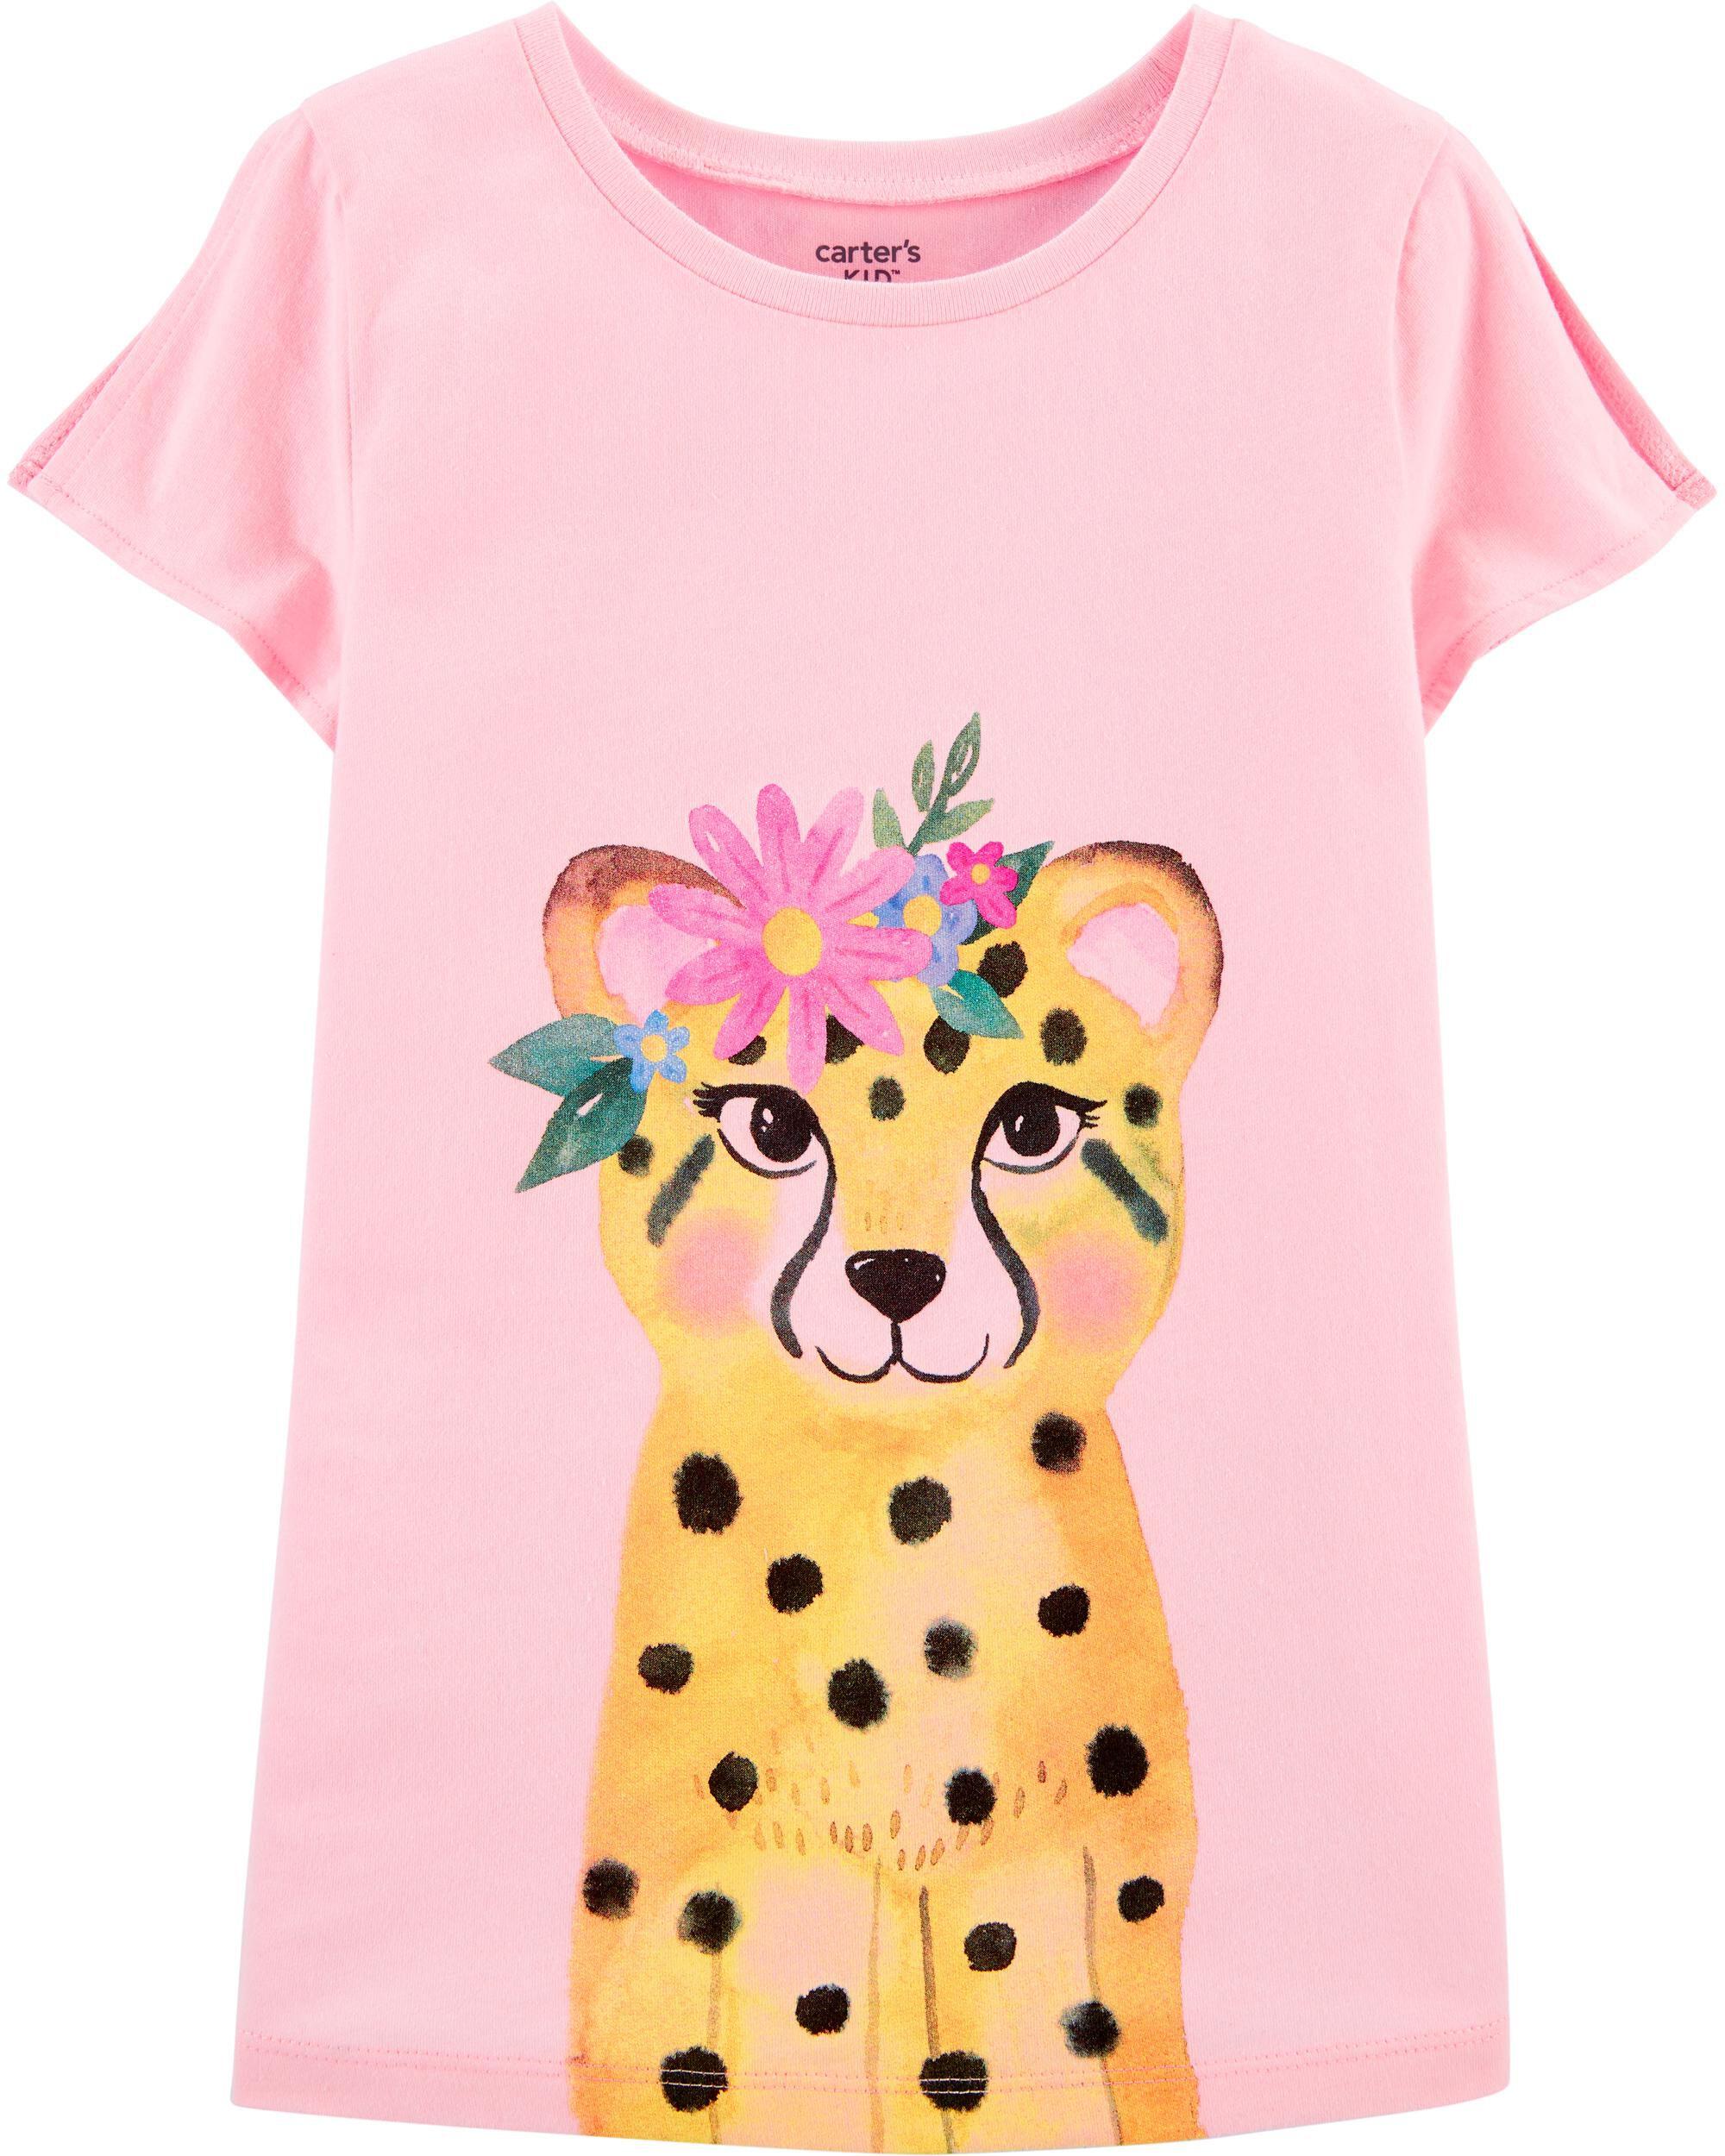 Sloth Kids Girls Short Sleeve Ruffles Shirt Tee for 2-6T